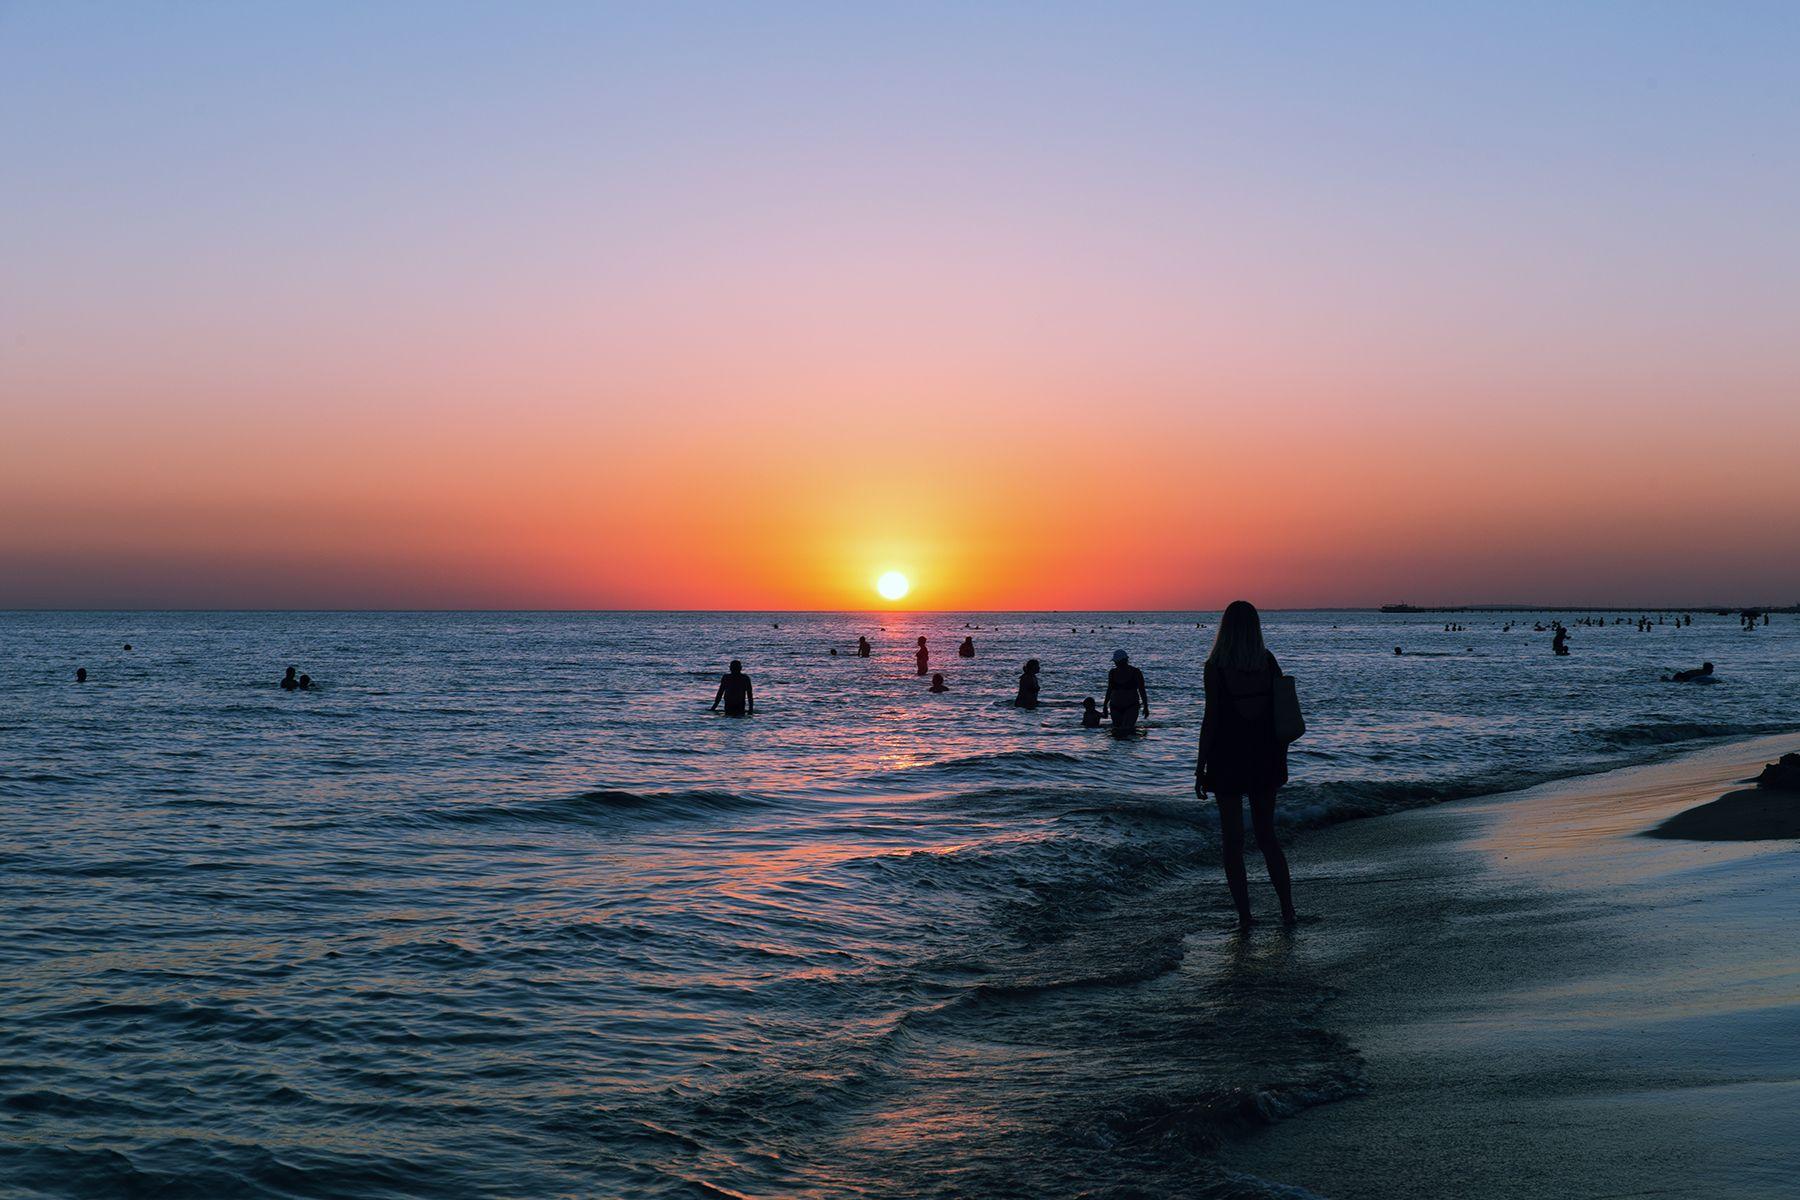 Стремление к Солнцу... море солнце закат пляж на пляже красота вау анапа джемете счастье